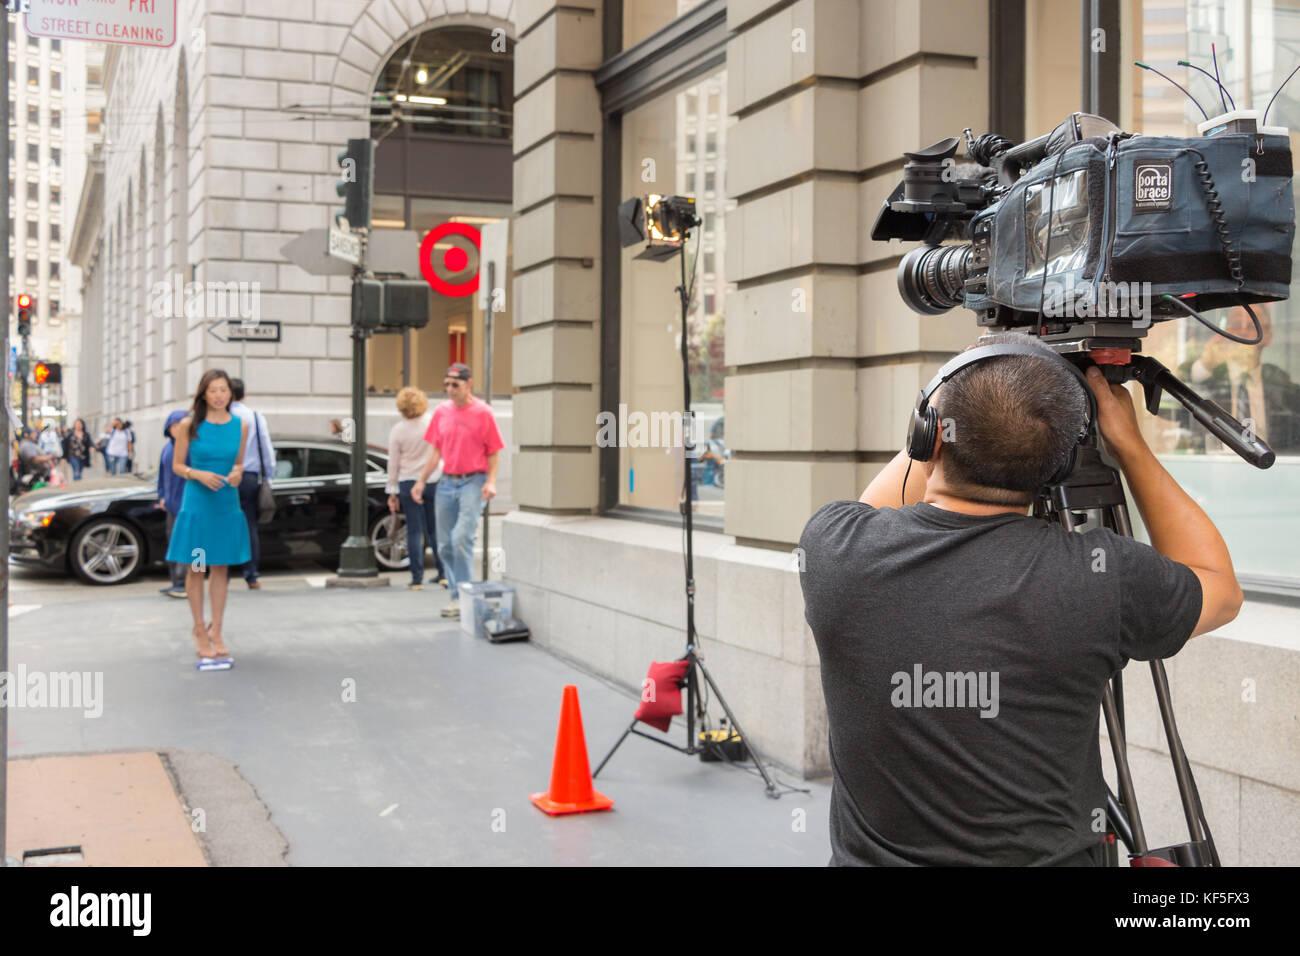 San Francisco, EE.UU. - septiembre 13th, 2017: un camarógrafo profesional masculino está transmitiendo Imagen De Stock